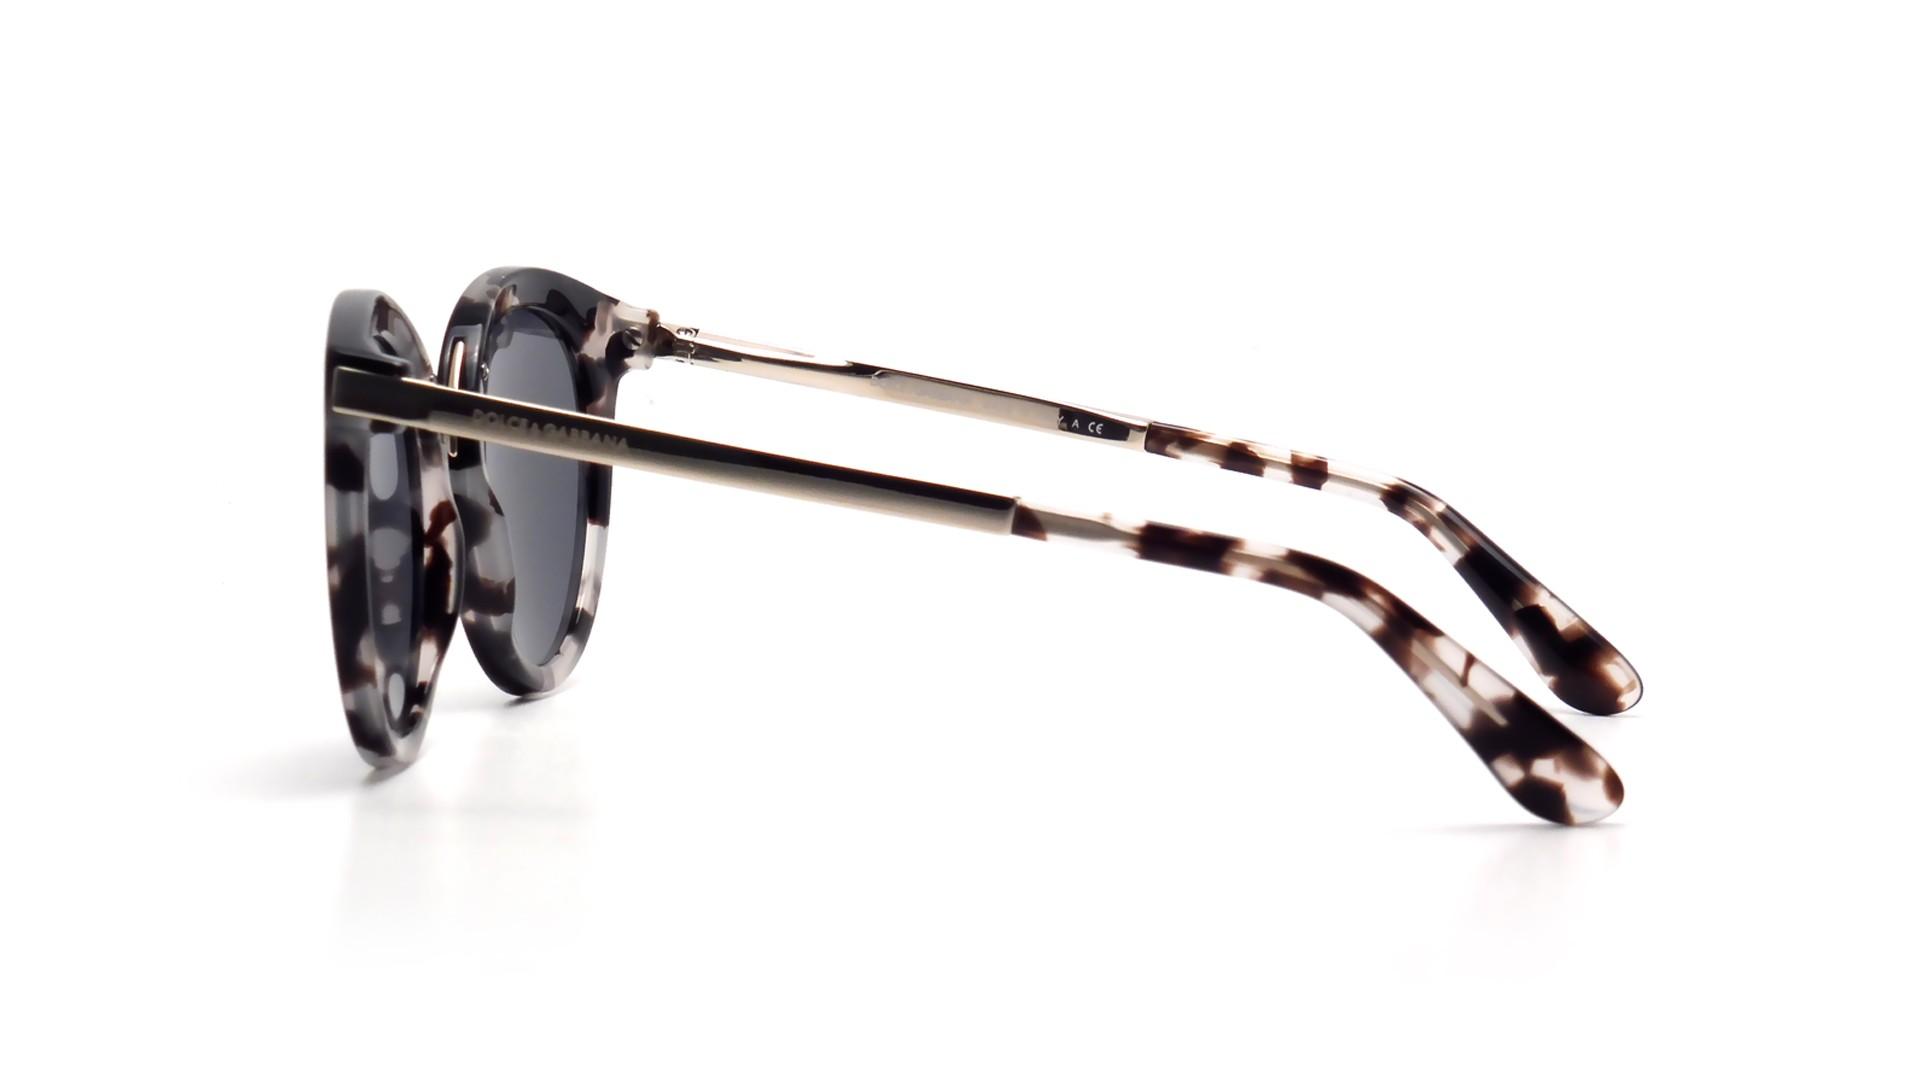 7cc6094ebb Dolce And Gabbana Sunglasses 3guk